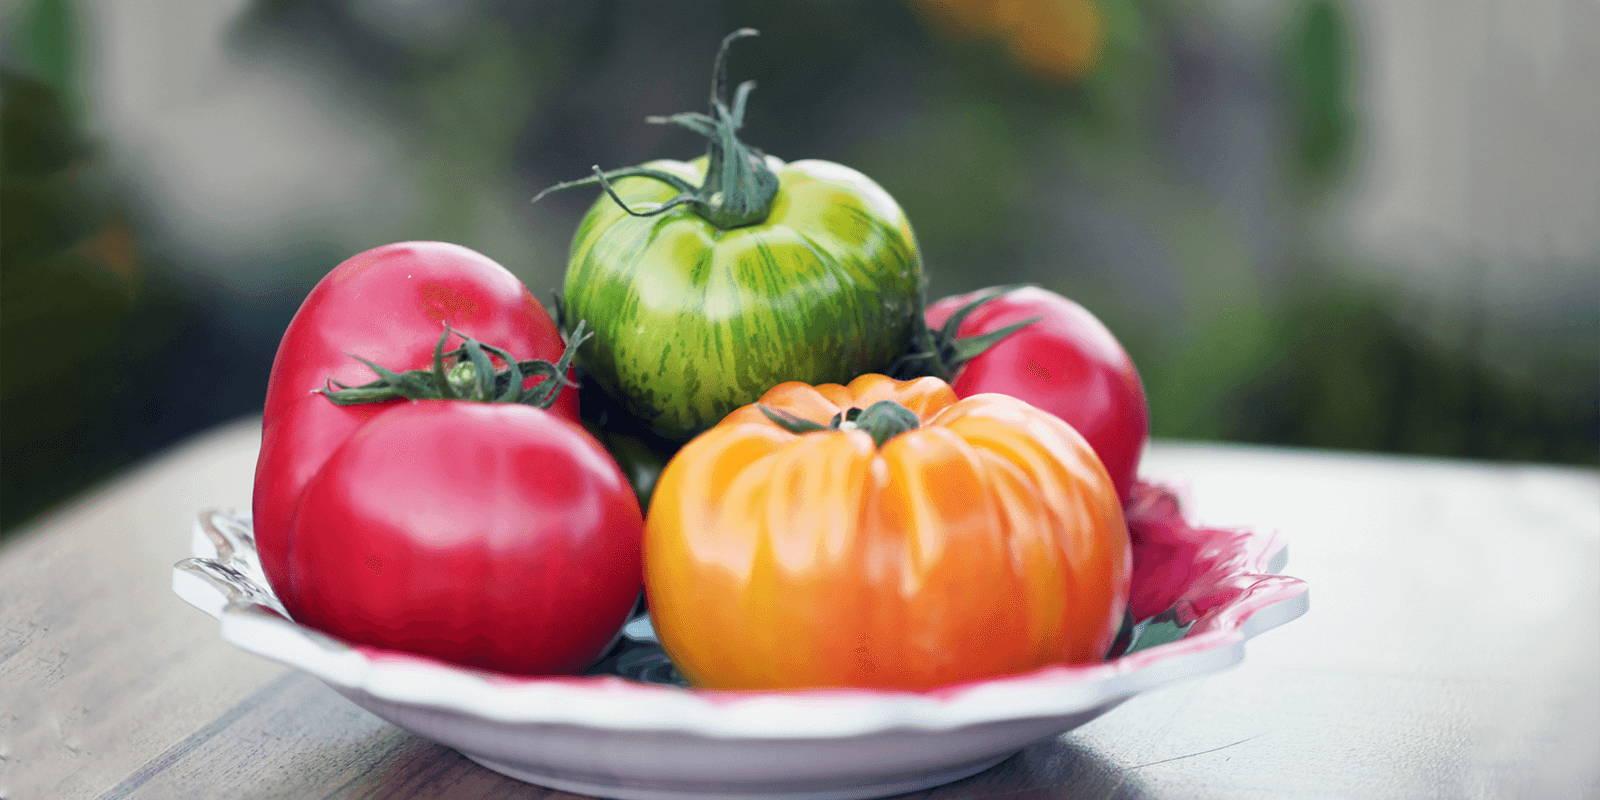 A bowl of fresh heirloom tomatoes